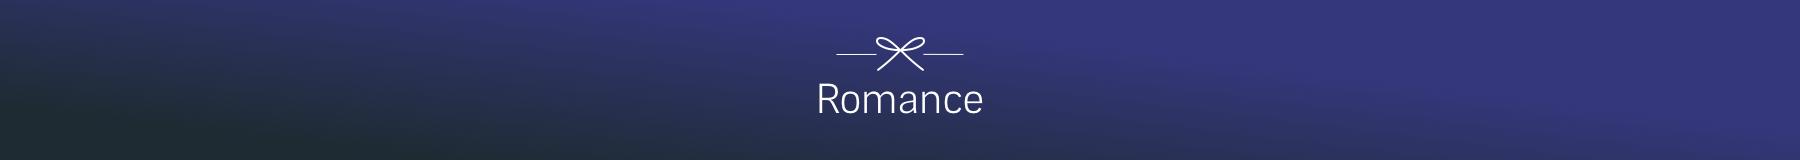 Gift Center - Romance